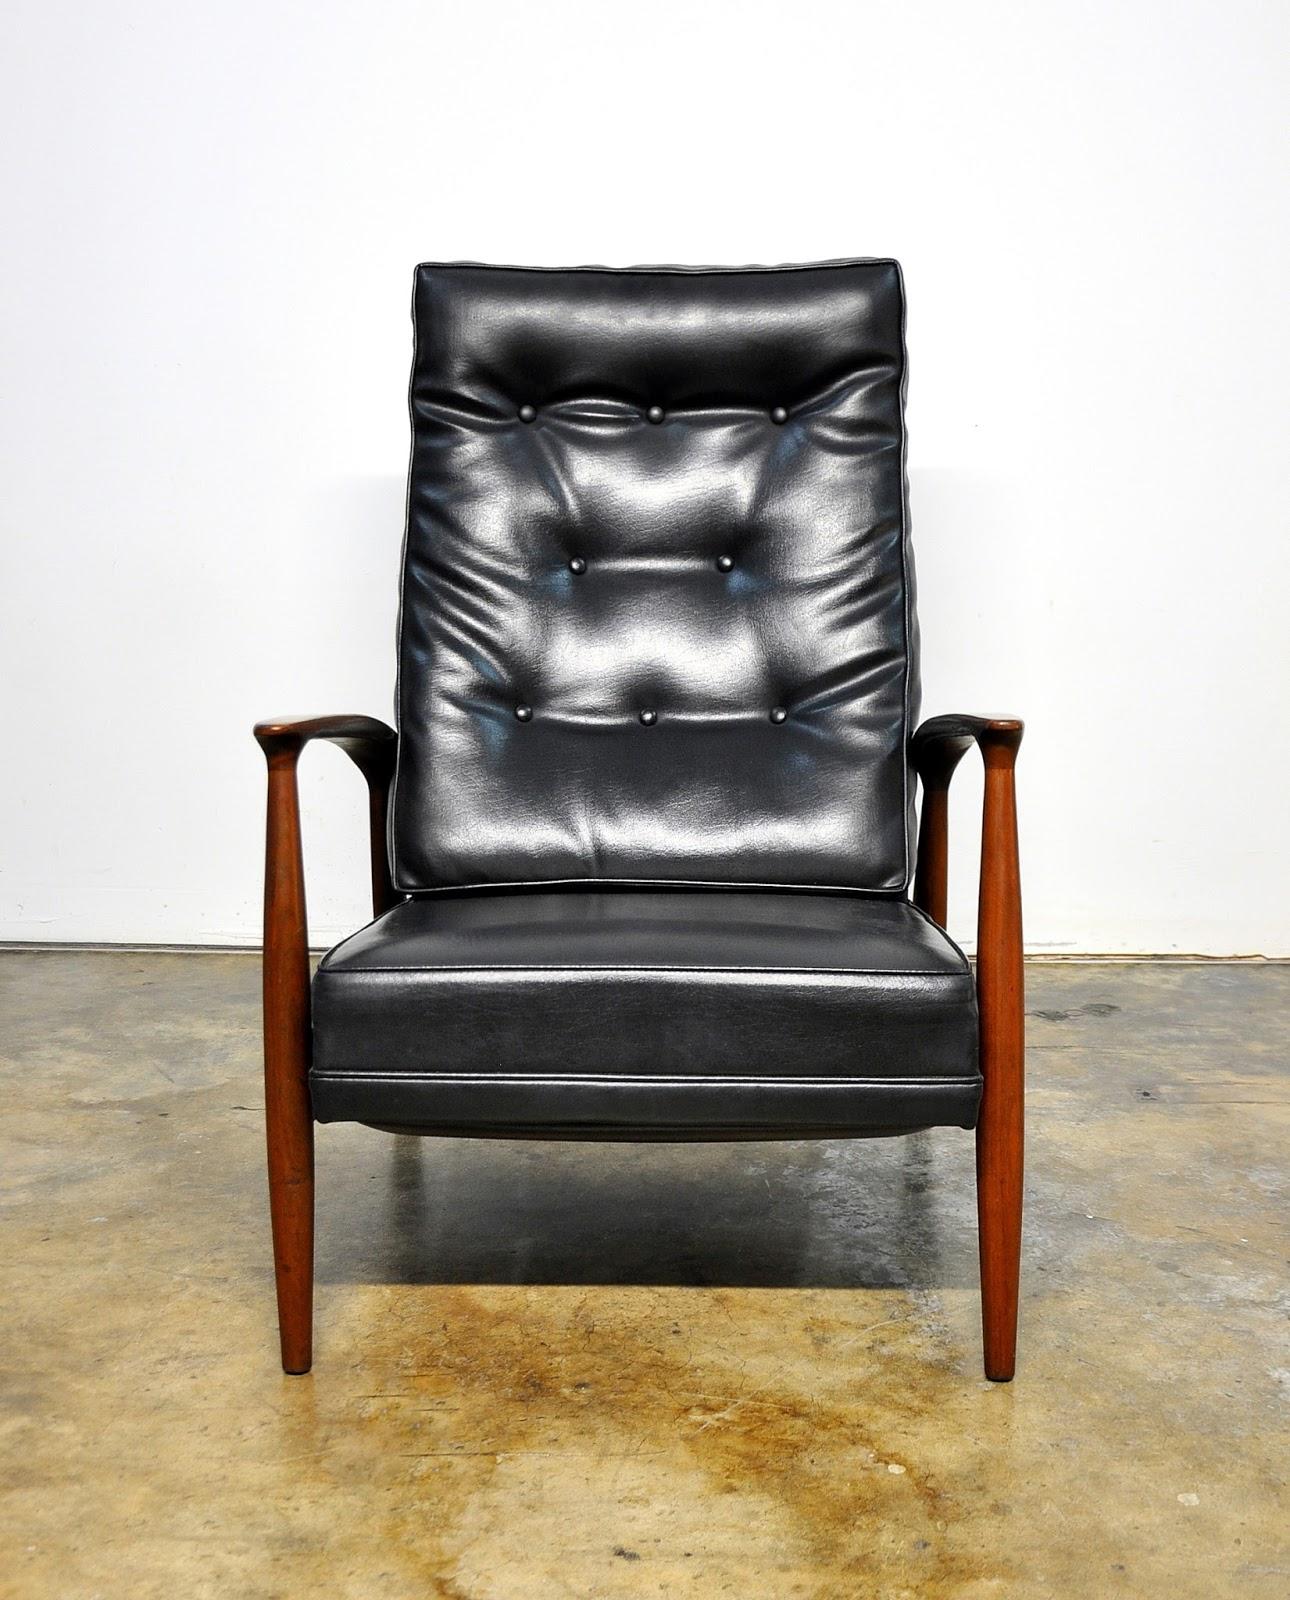 Milo Baughman Chairs